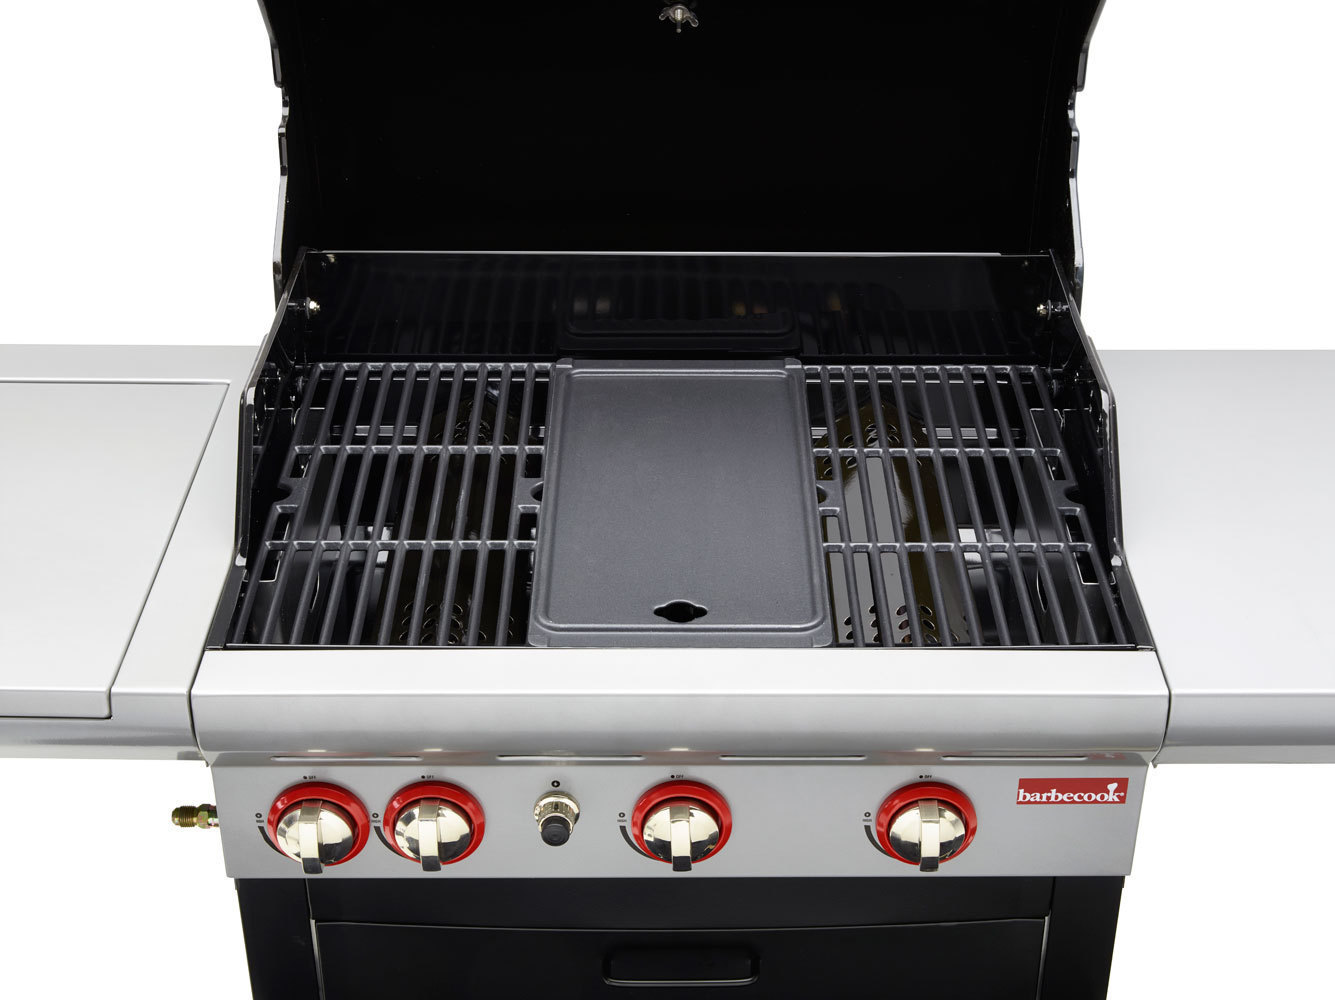 Plancha reversible hierro fundido barbacoas barbecook comprar - Barbacoas hierro fundido ...